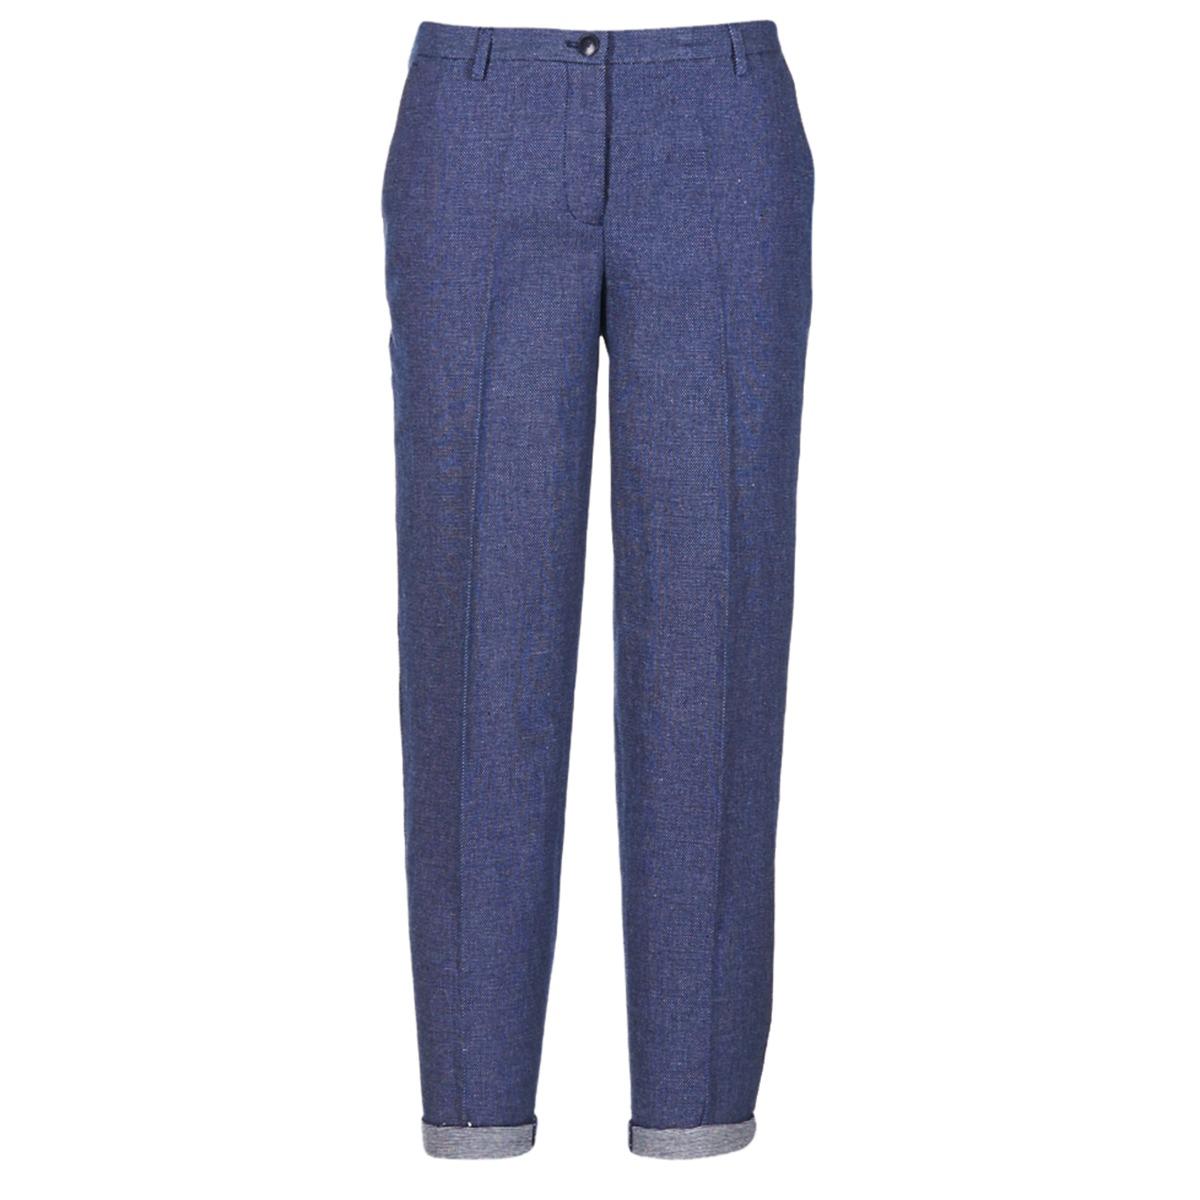 f4e9581bd8c2 Παντελόνι πεντάτσεπο Armani jeans JAFLORE Σύνθεση  Βαμβάκι